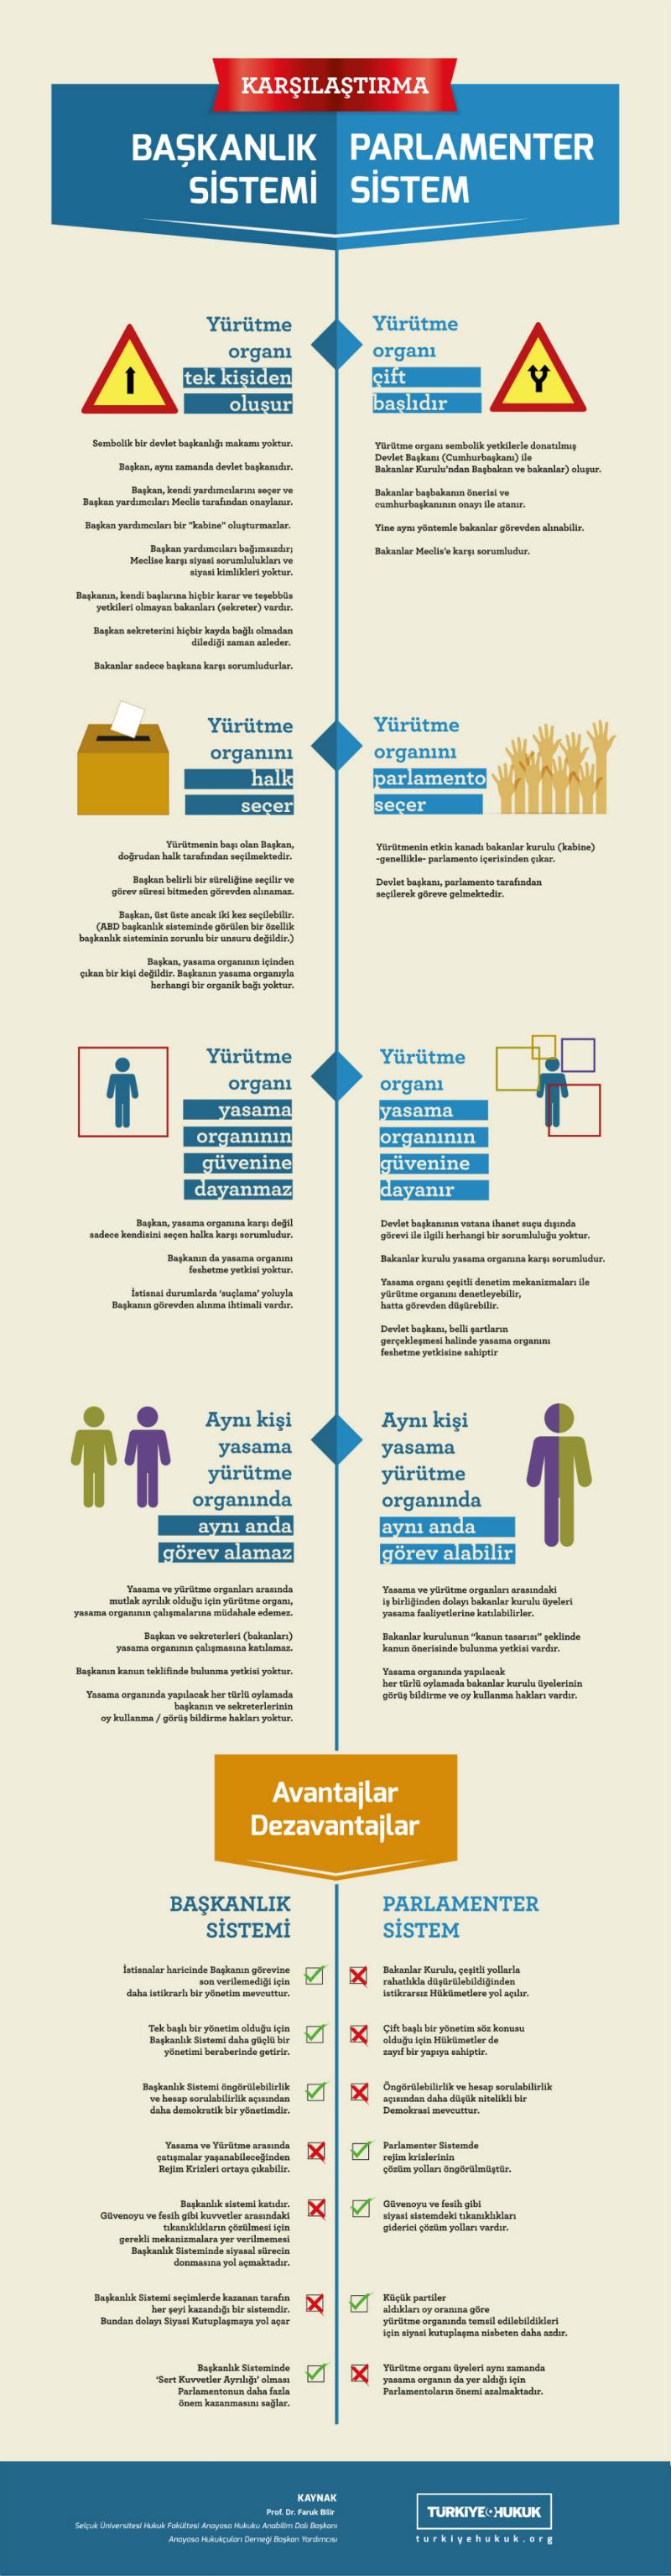 baskanlik sistemi parlamenter sistem